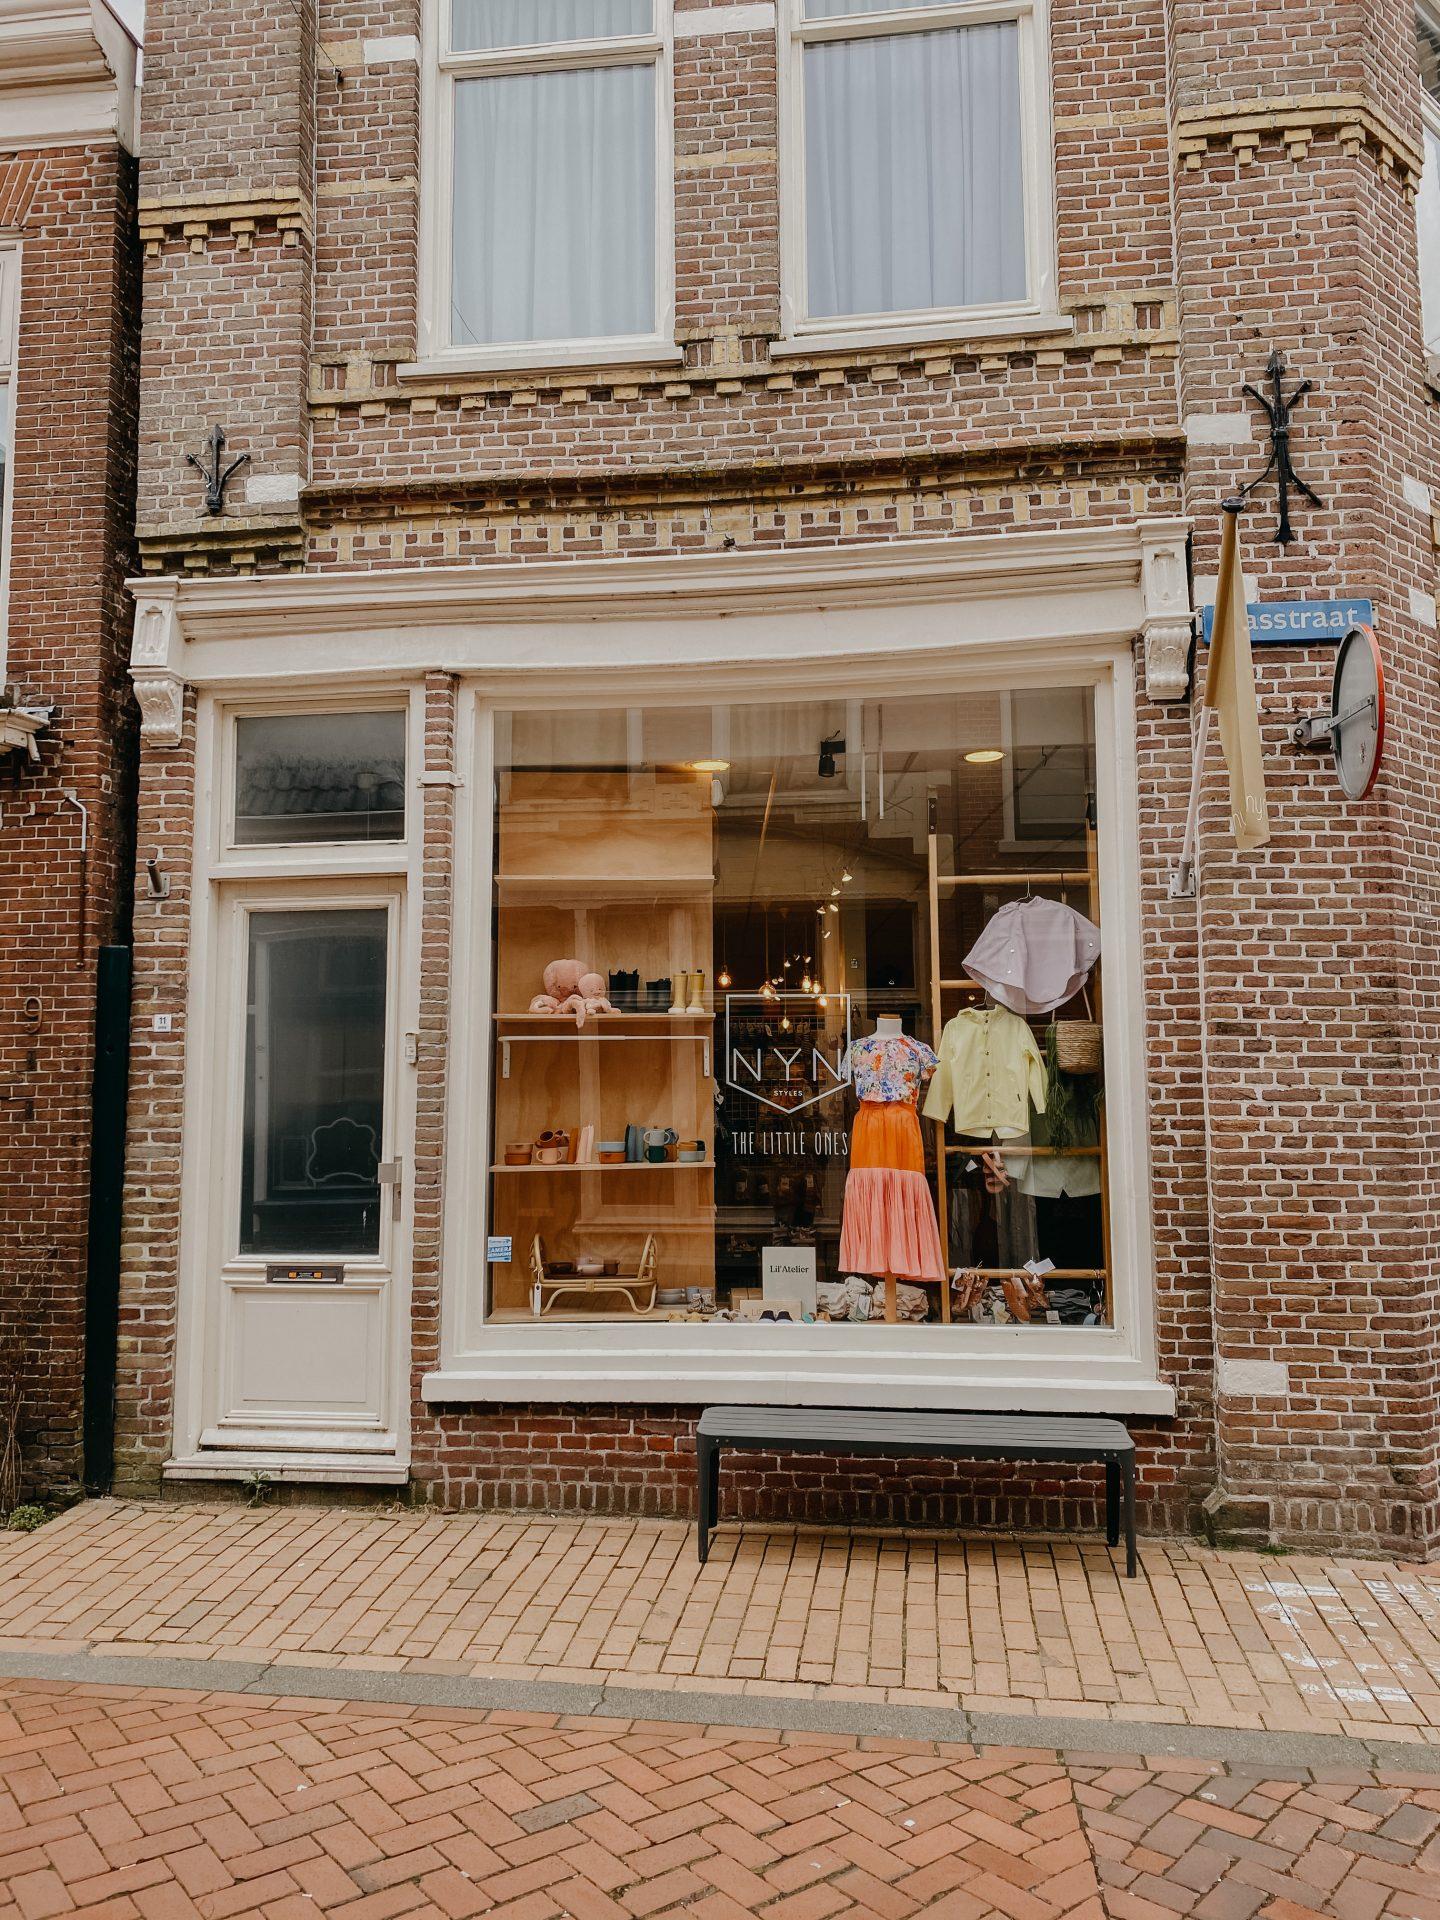 kinderkledingwinkel Friesland Dokkum Nynstyles